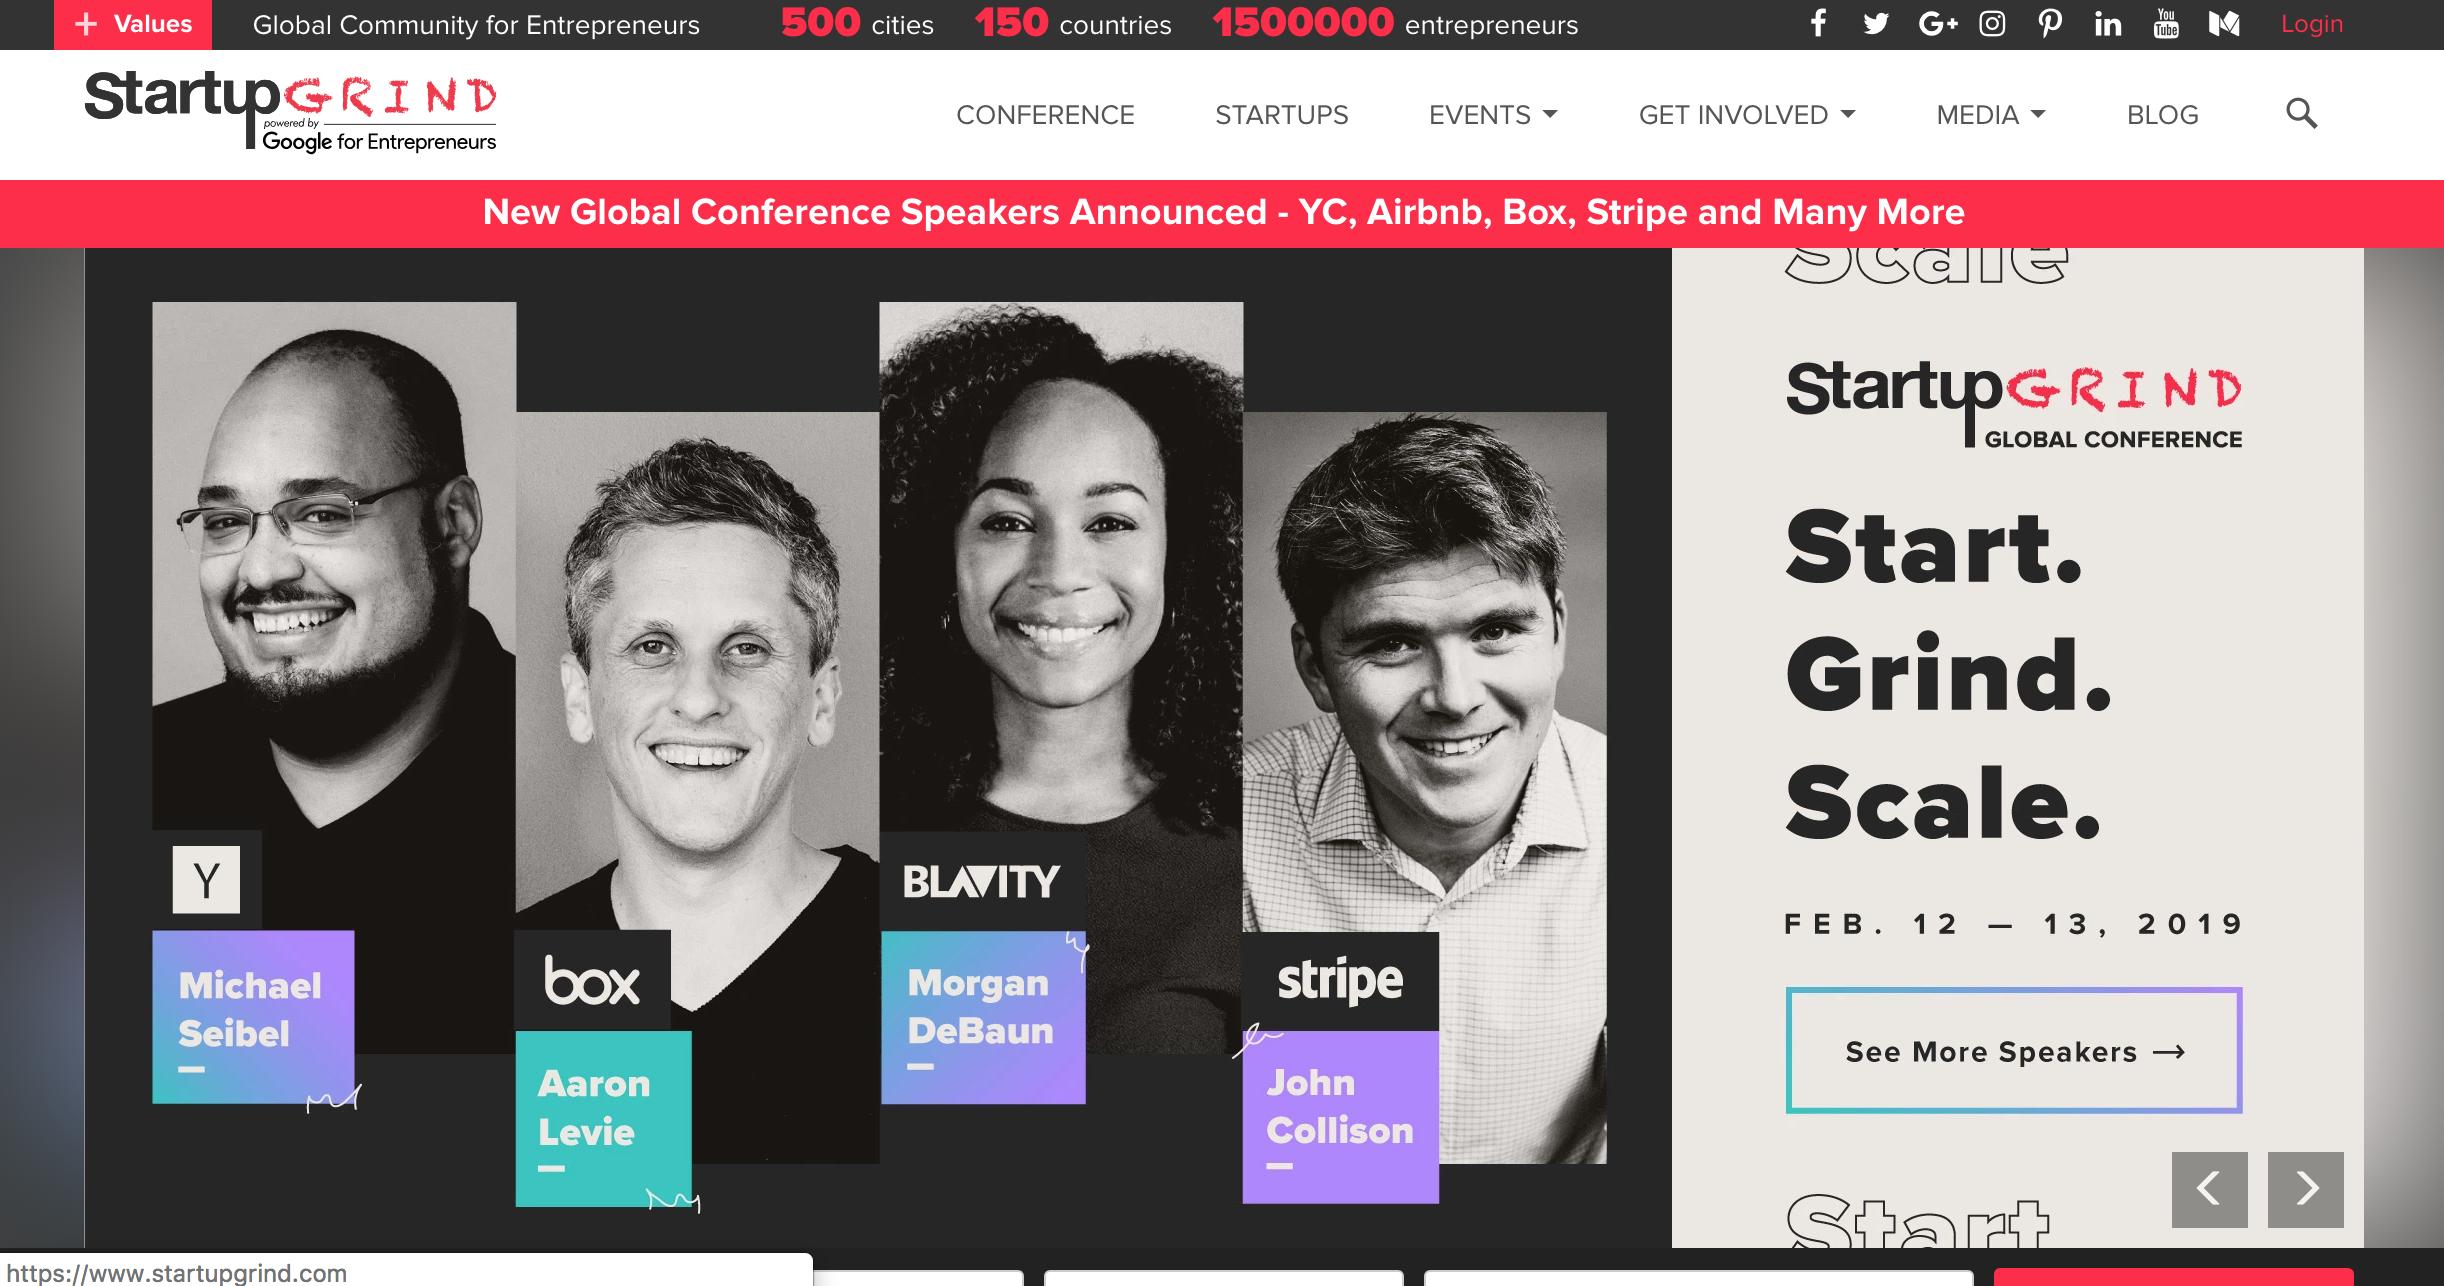 startup-conference-inspiration-brainstorming.png